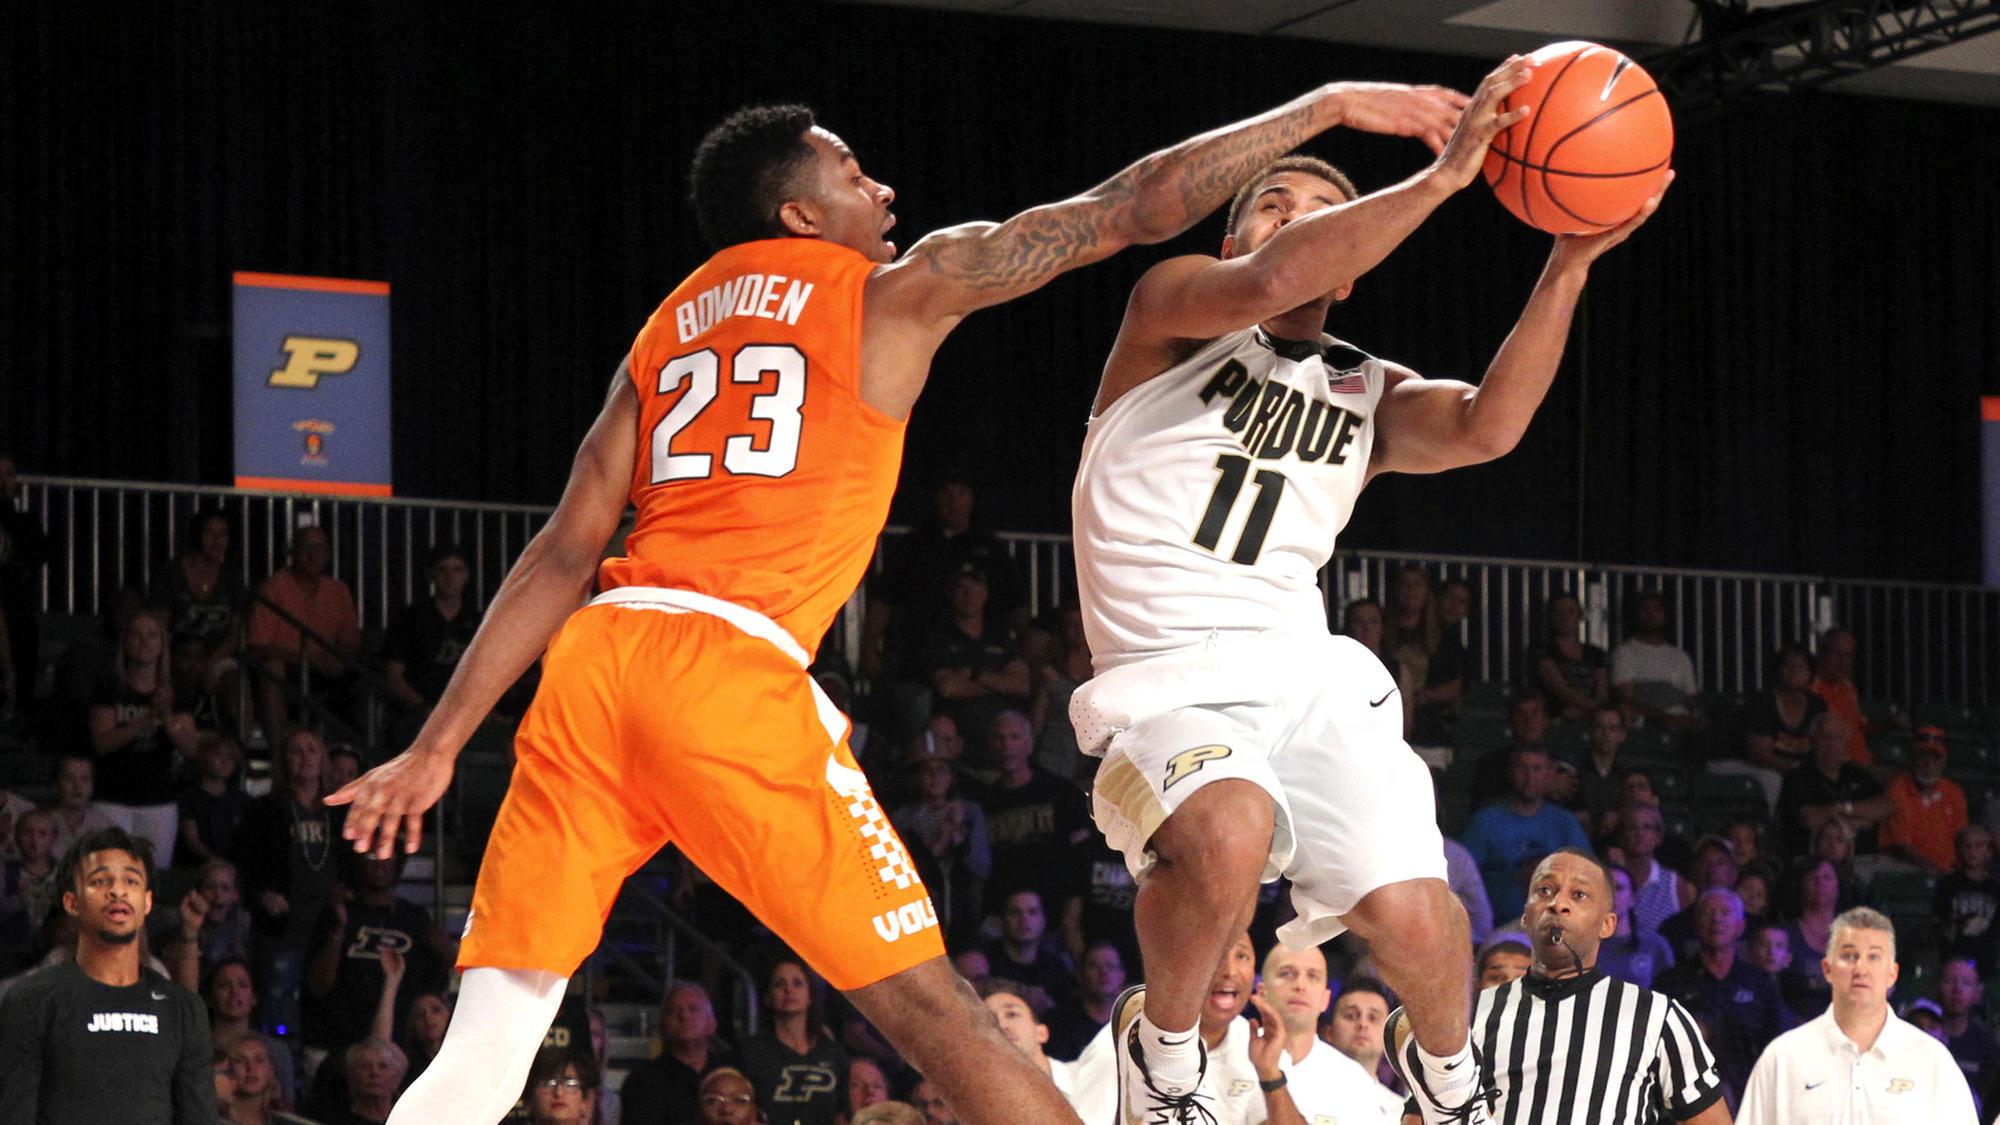 La-sp-college-basketball-roundup-20171122